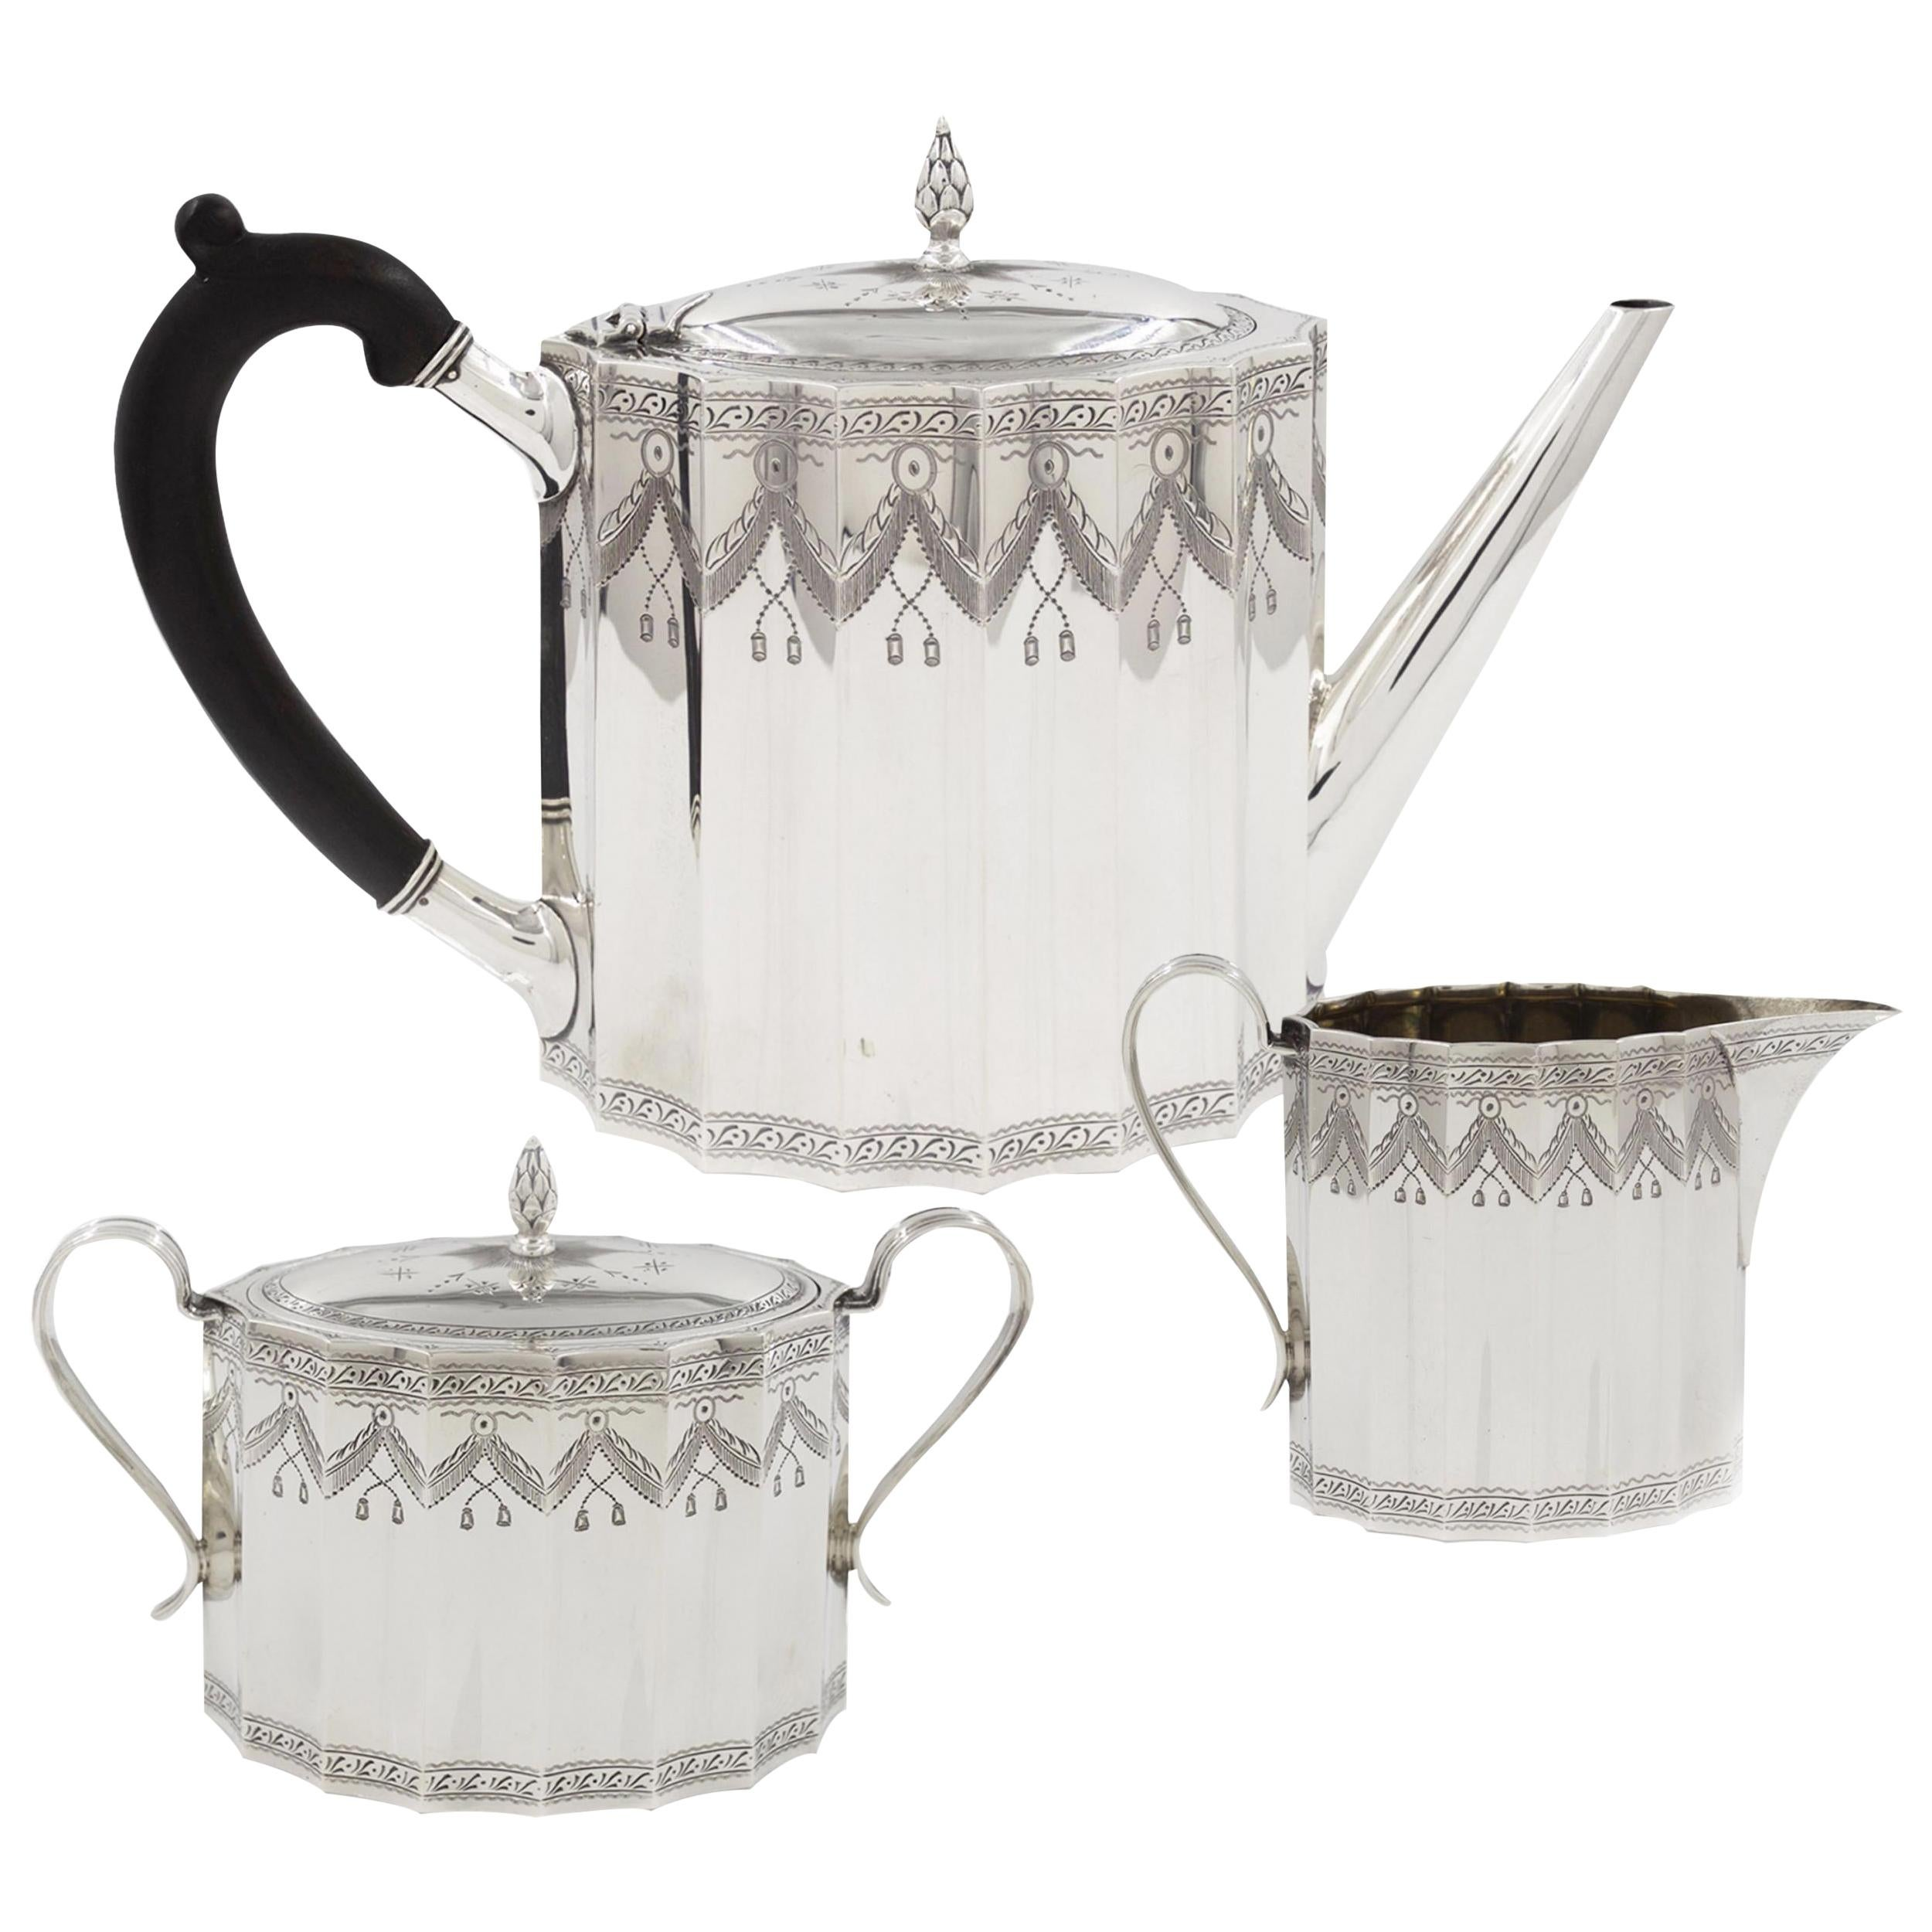 Fine Gorham Co. Sterling Silver Tea Coffee Service Set, 20th Century